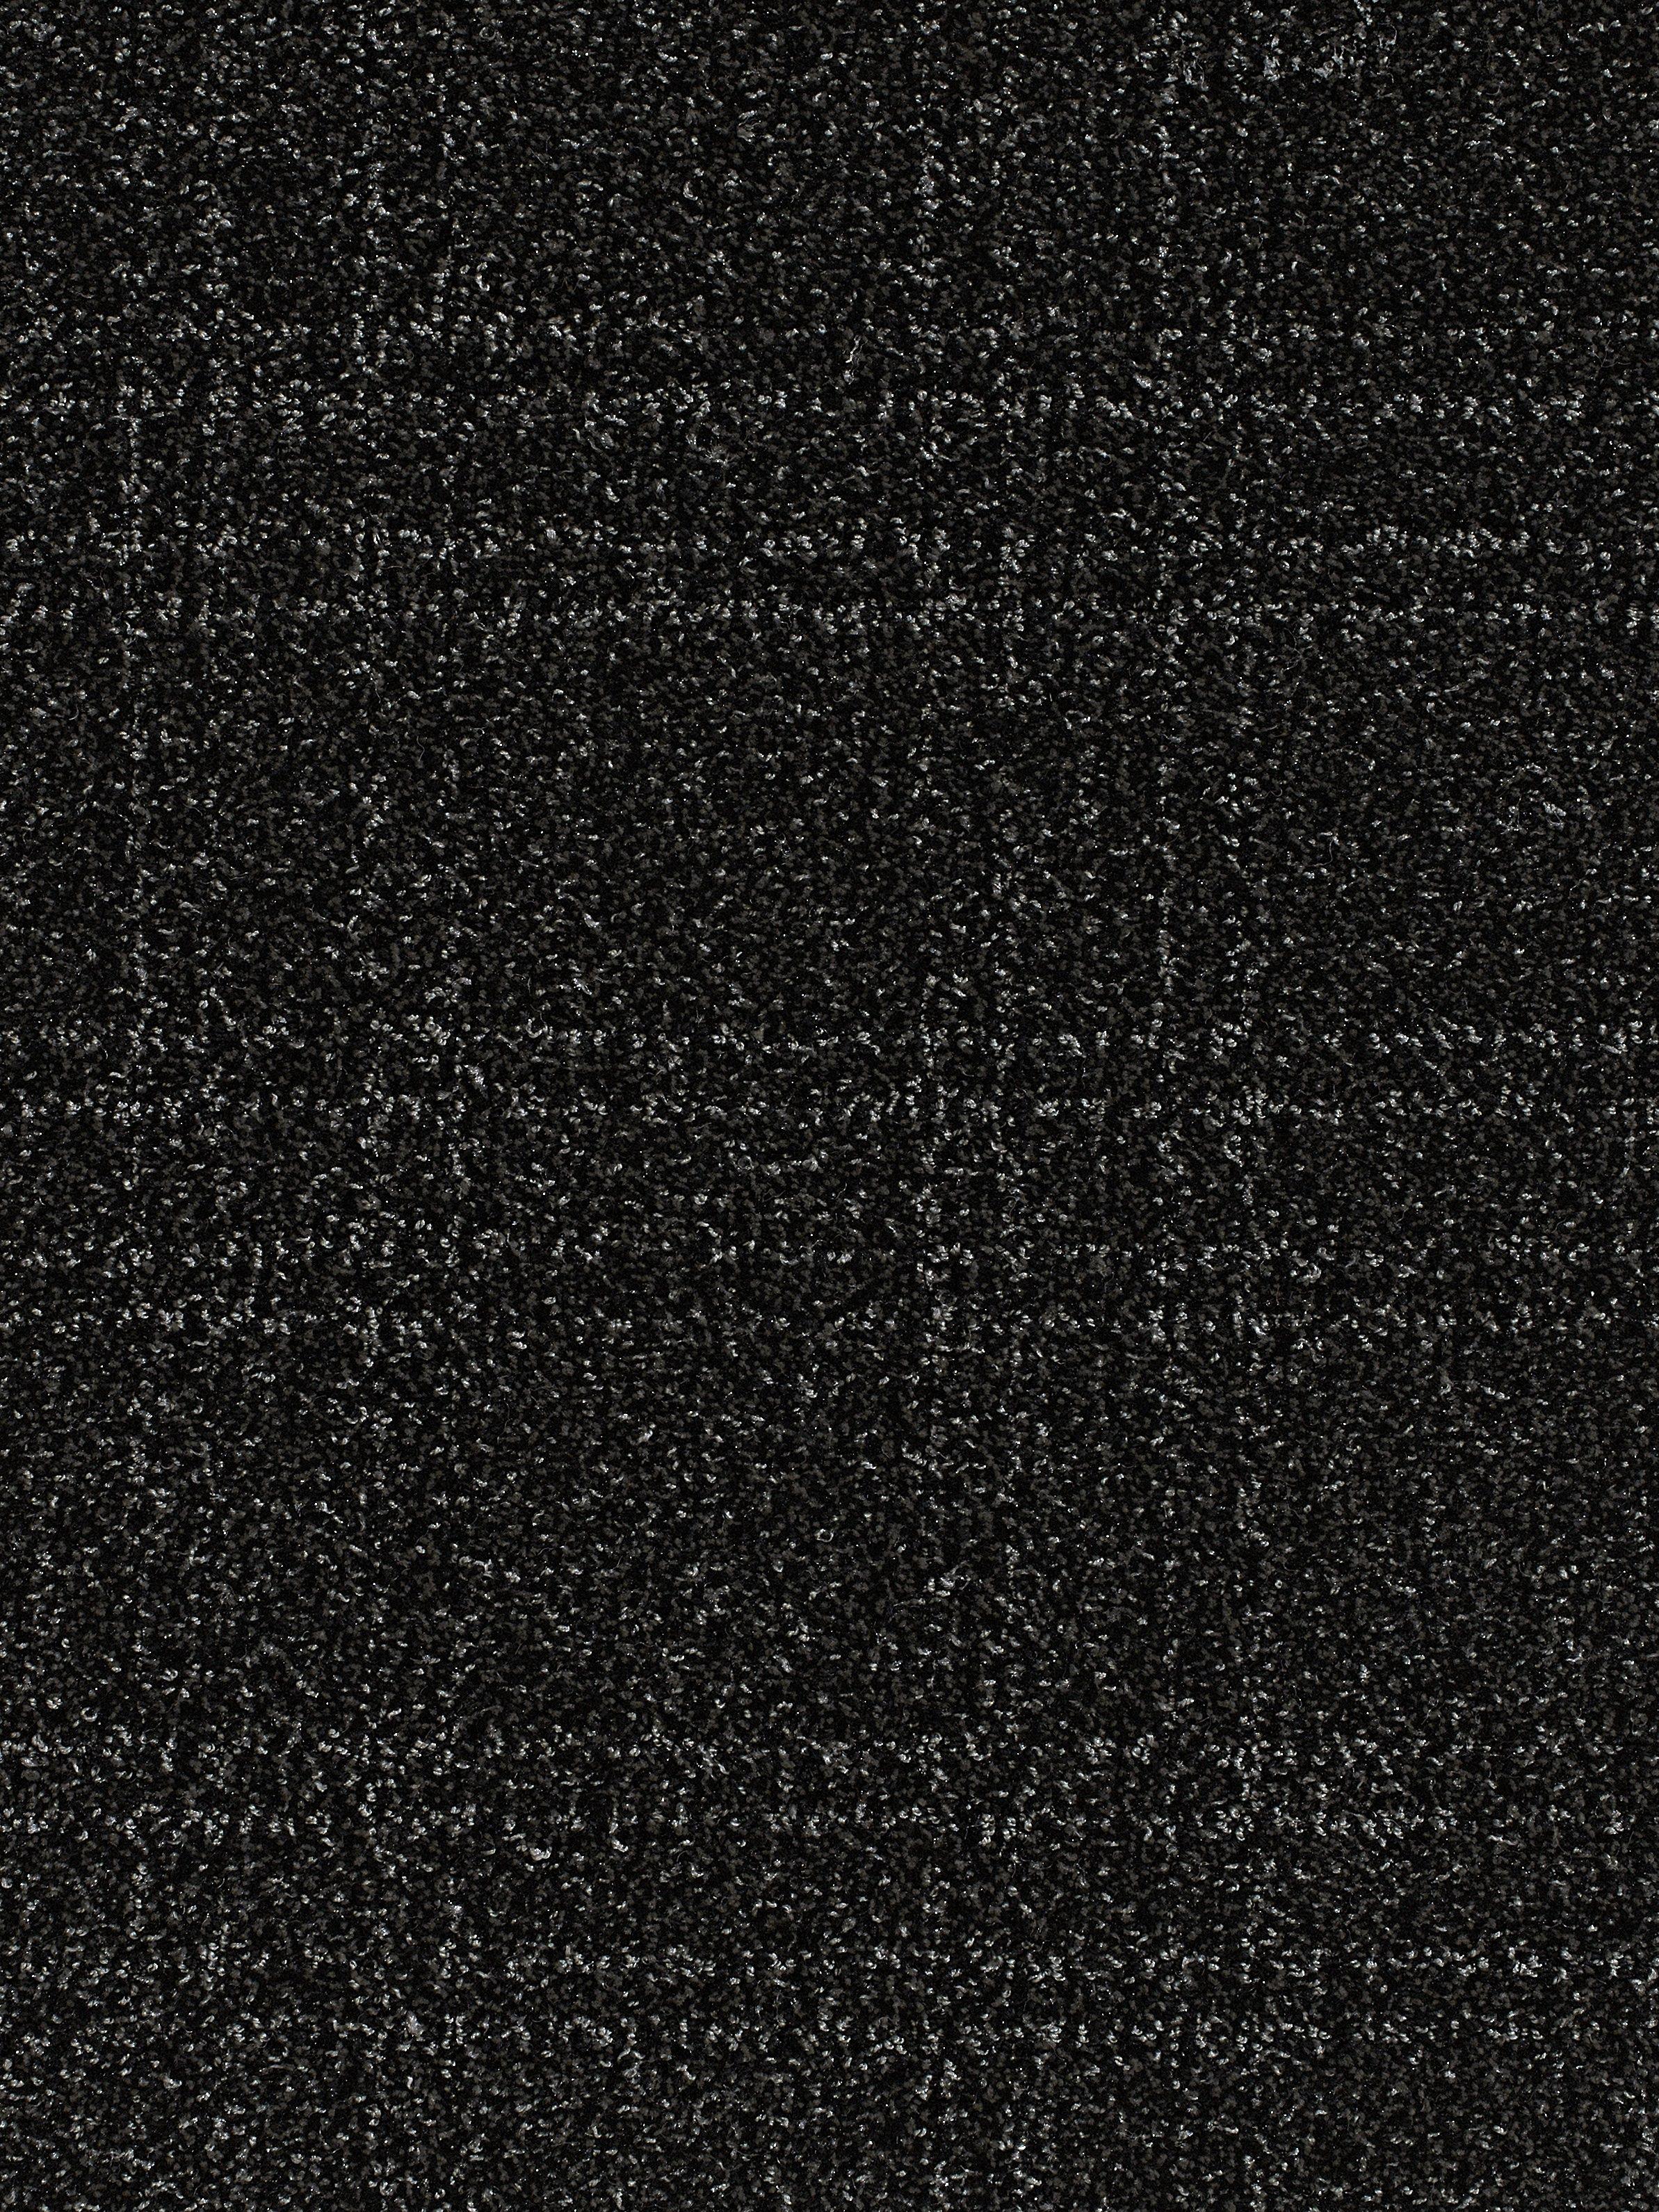 Totally Carpet Broadloom Plaid Black & Charcoal carpet  Luxurious Carpet  1001-2509 Exquisite   Totally Carpet 1011-B1116 Bach   Totally Carpet